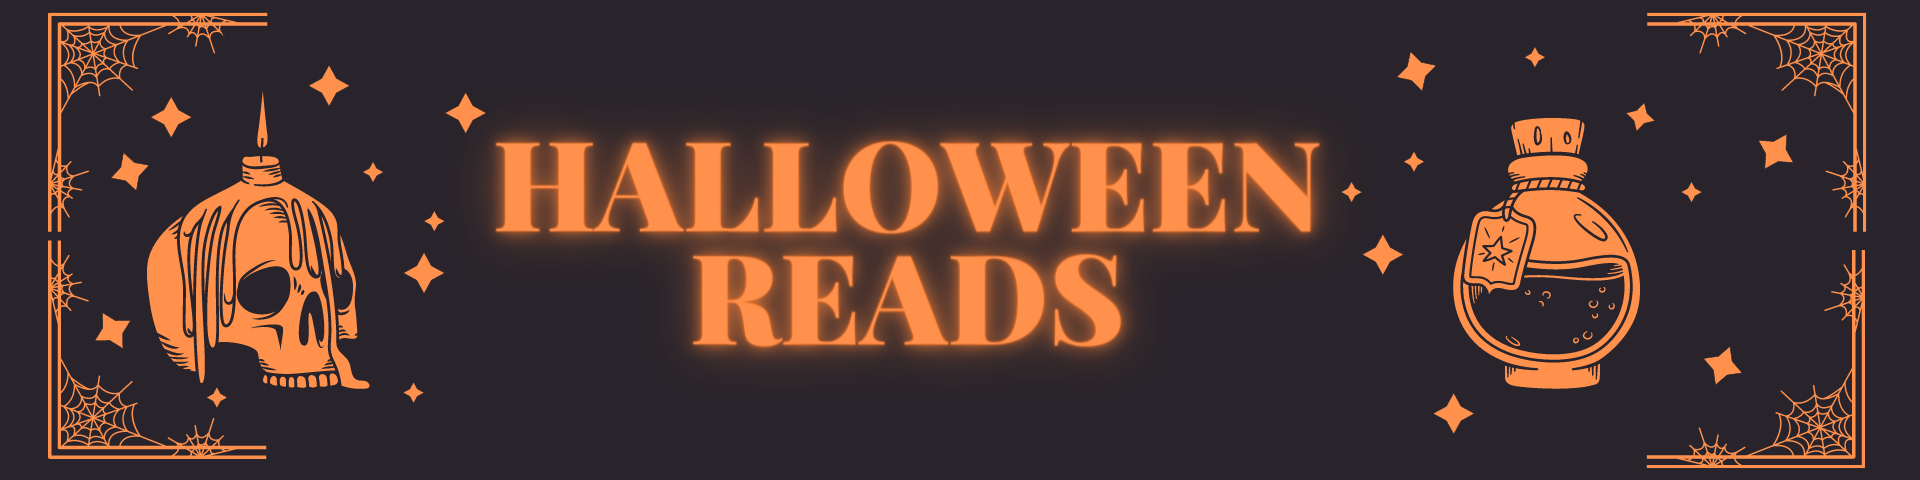 "black & orange image that says ""hallowe"